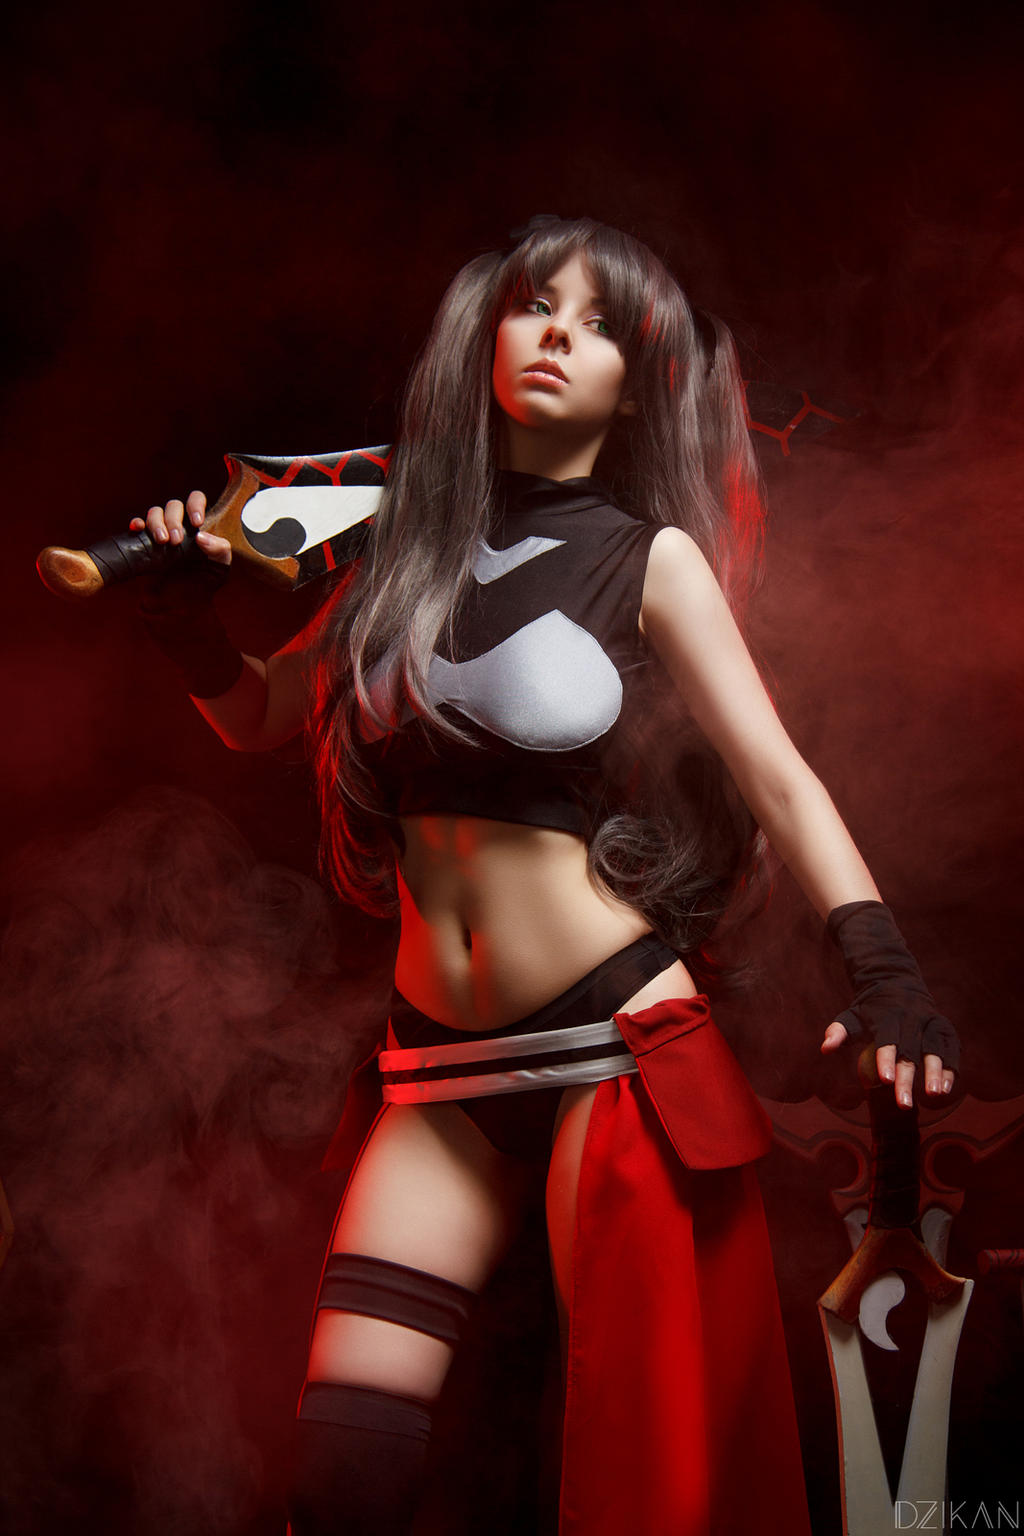 Fate/Stay Night - Rin Tohsaka (Archer ver) cosplay